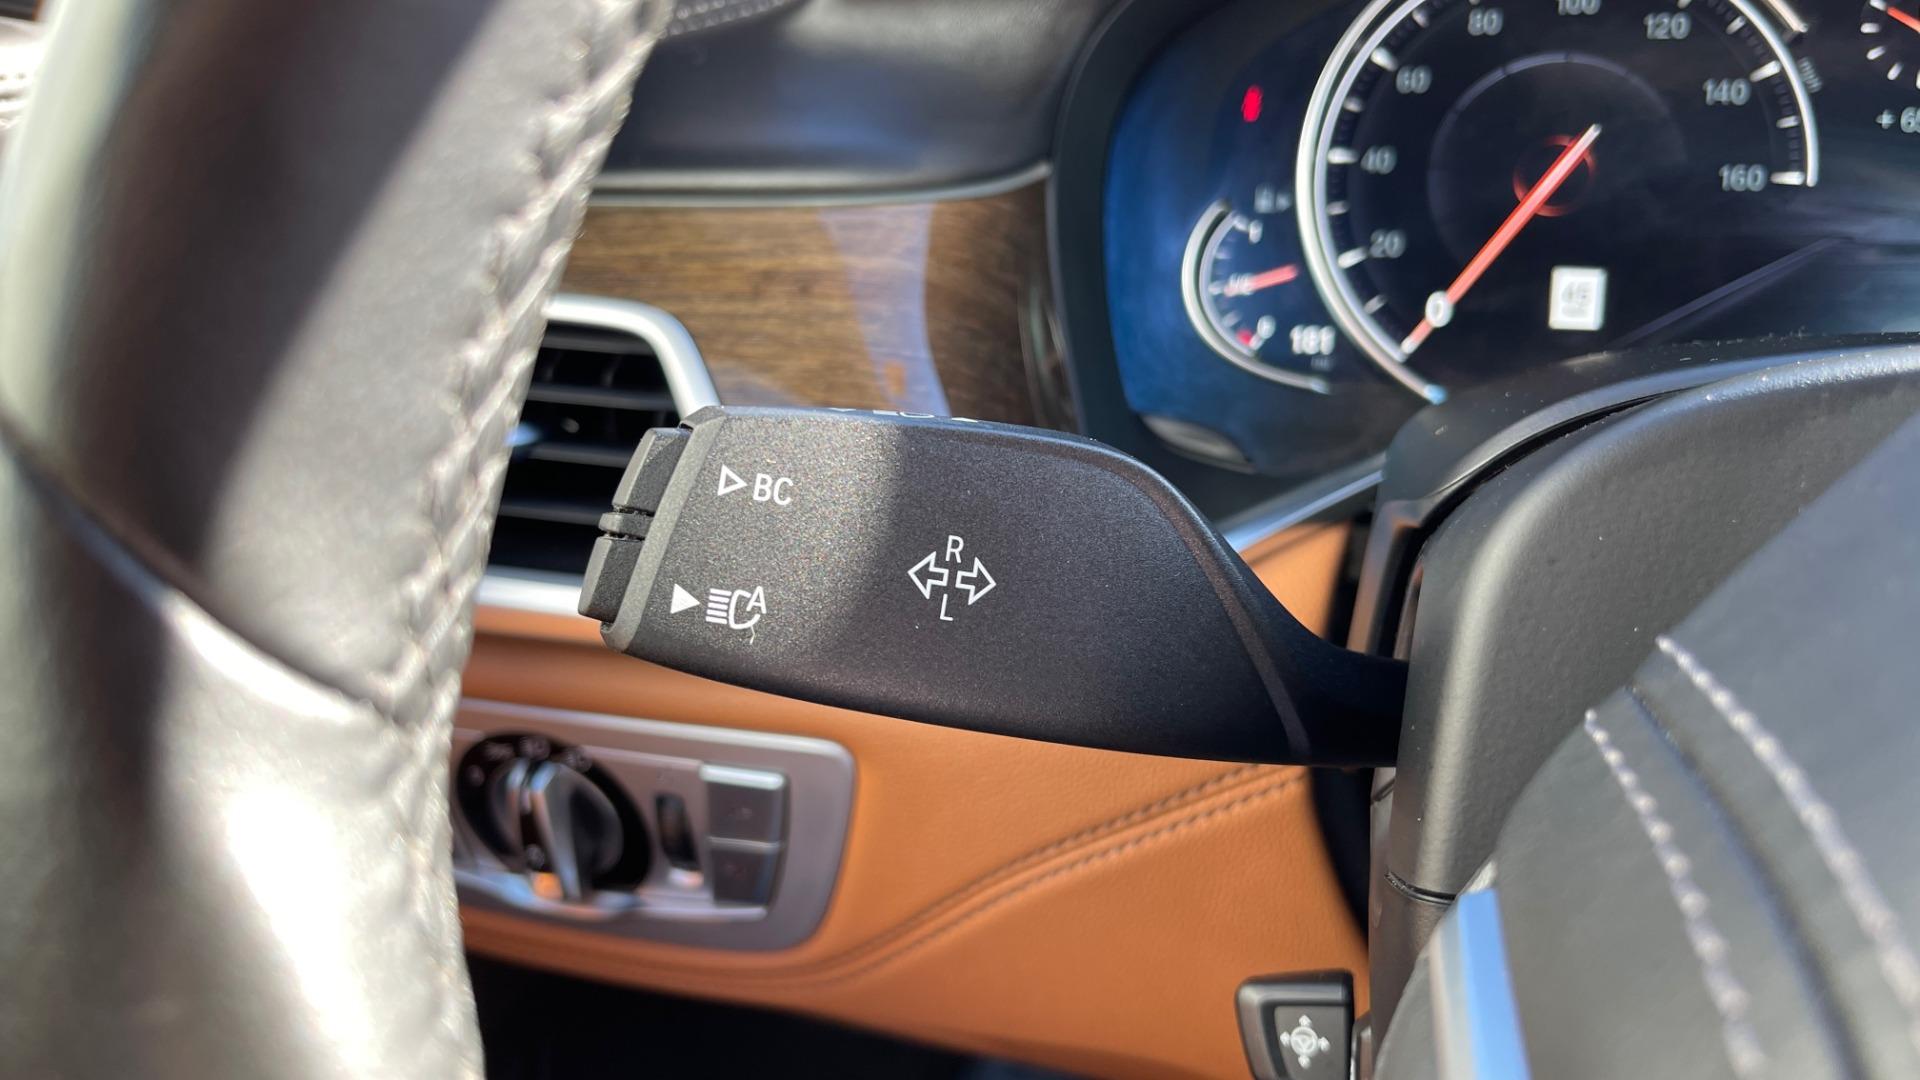 Used 2019 BMW 7 SERIES 750I XDRIVE M-SPORT / EXEC PKG / DRVR ASST PLUS / CLD WTHR / PAR for sale $60,995 at Formula Imports in Charlotte NC 28227 33